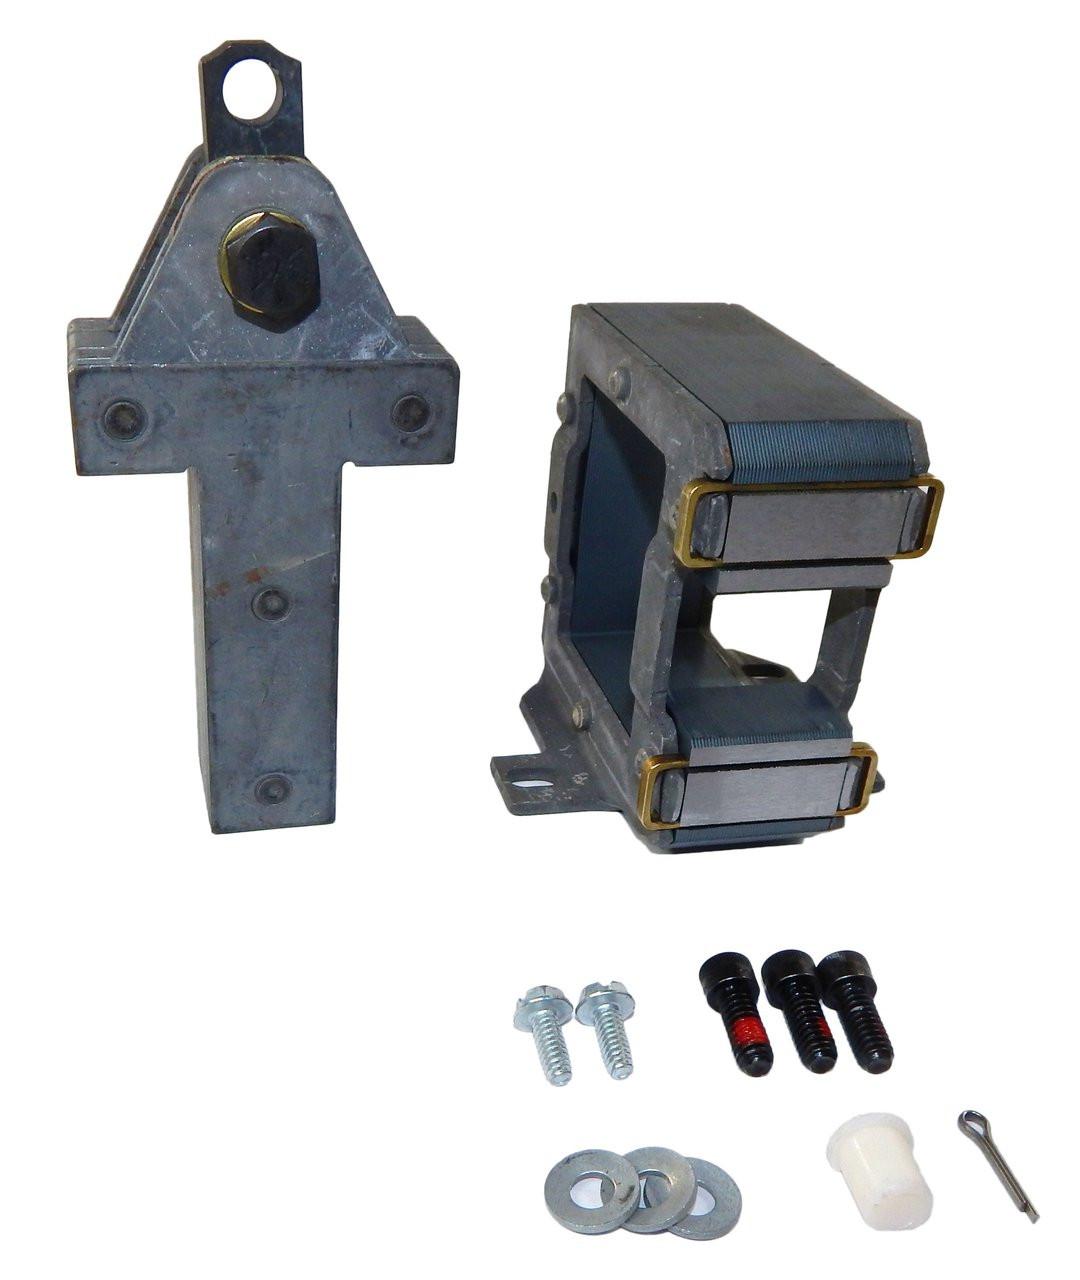 stearns brake wiring diagram simple origami cat solenoid kit 8 ac replacement 5 66 5081 00